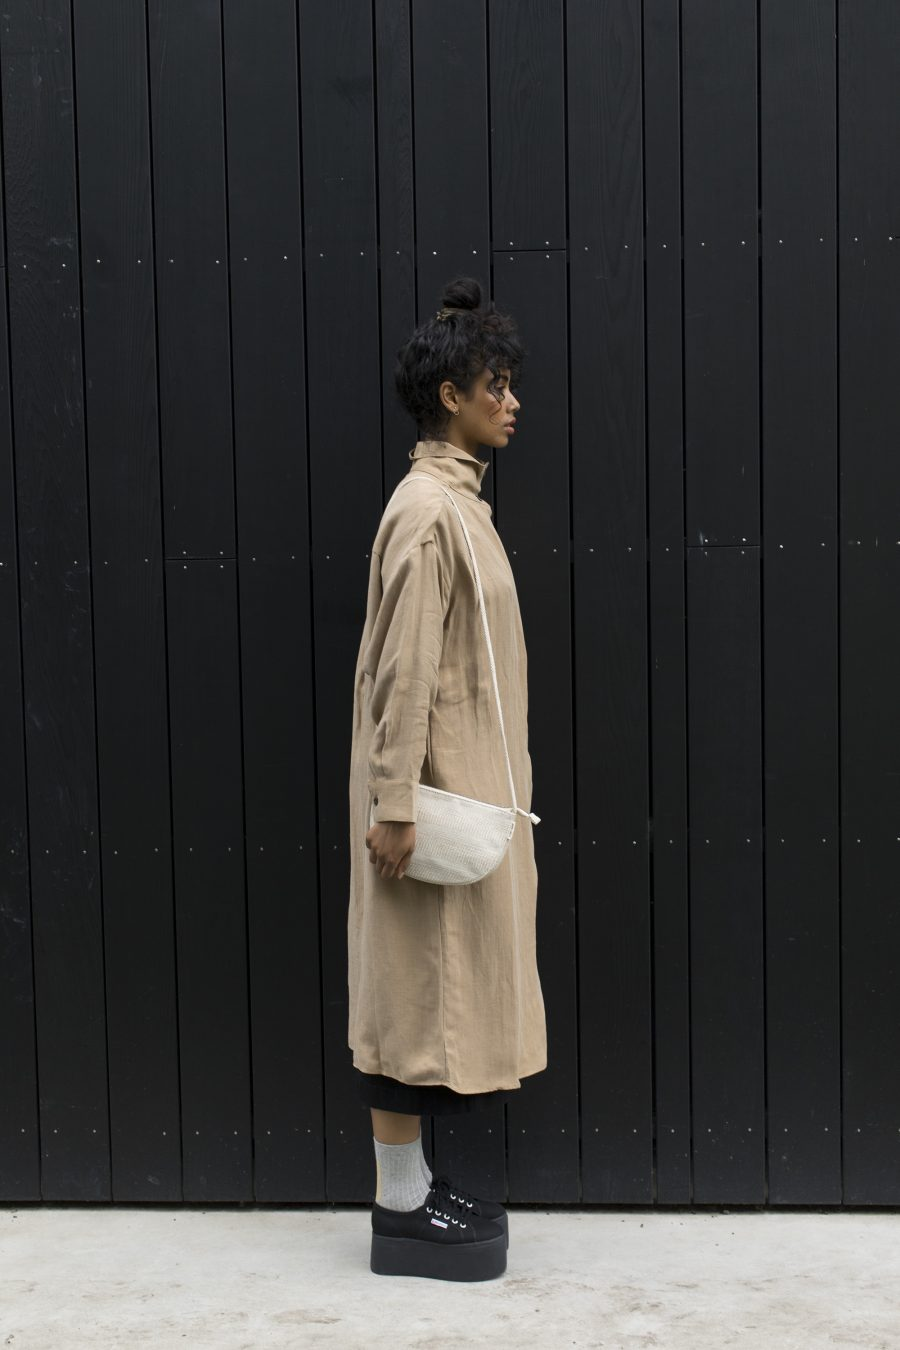 1601367 – Monk & Anna – style – Farou half moon bag – Linen